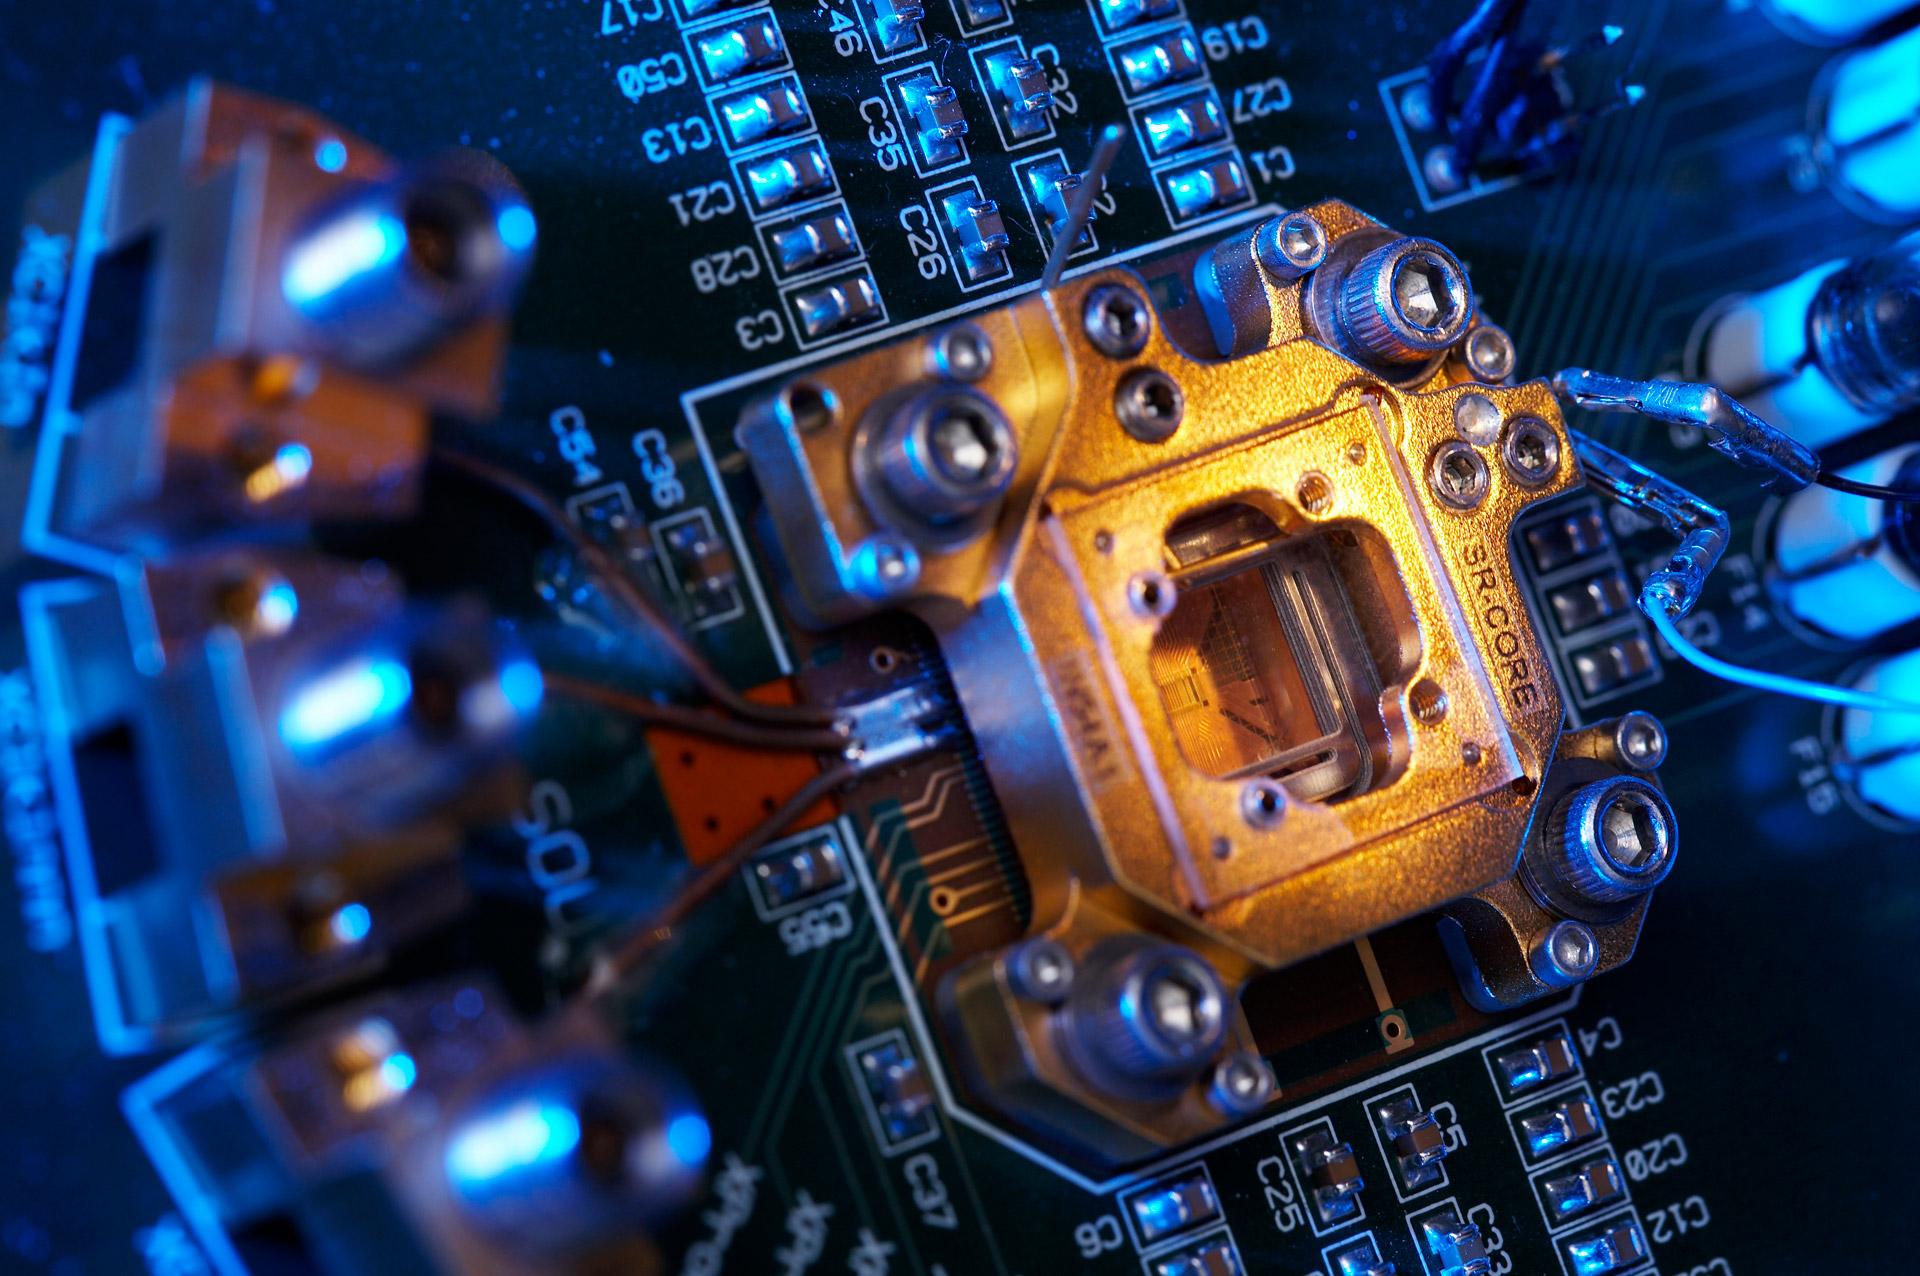 download geek electronics resistors transistors HD Wallpaper 1920x1276